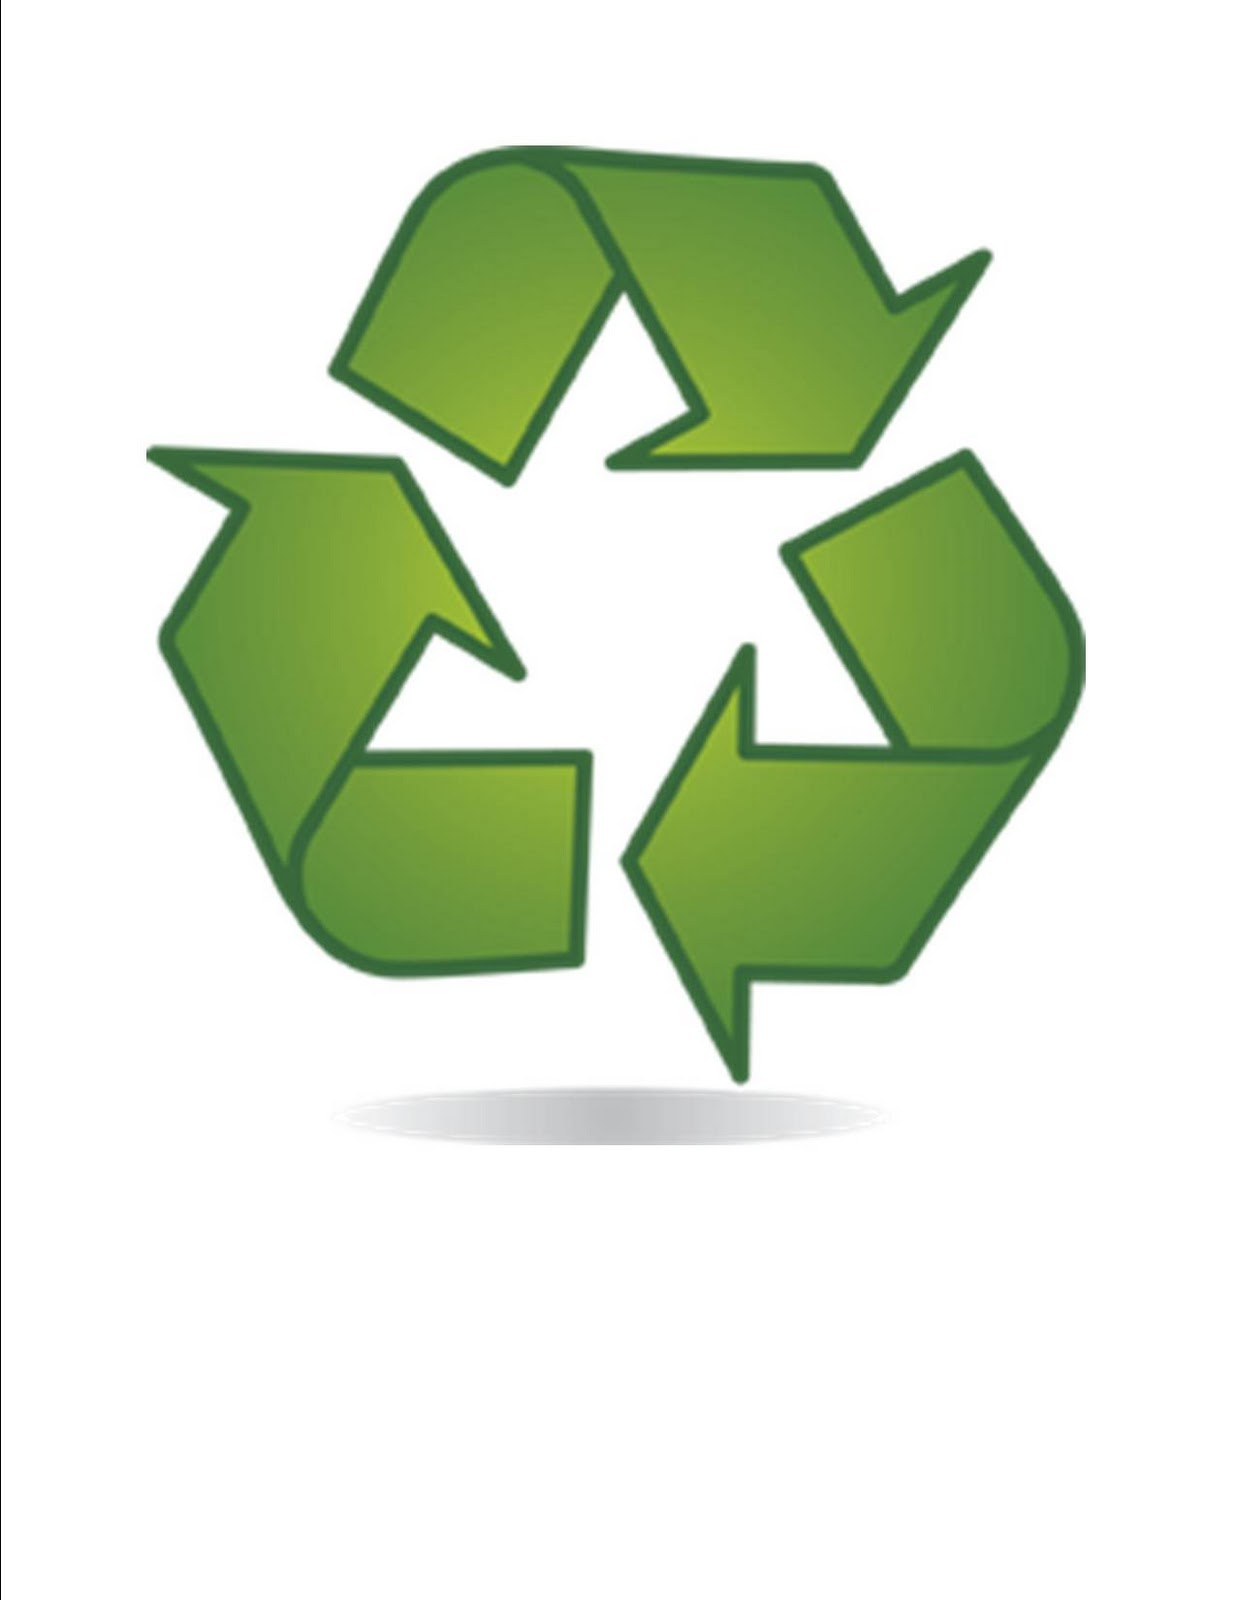 Recycling Symbol Printable Worksheet